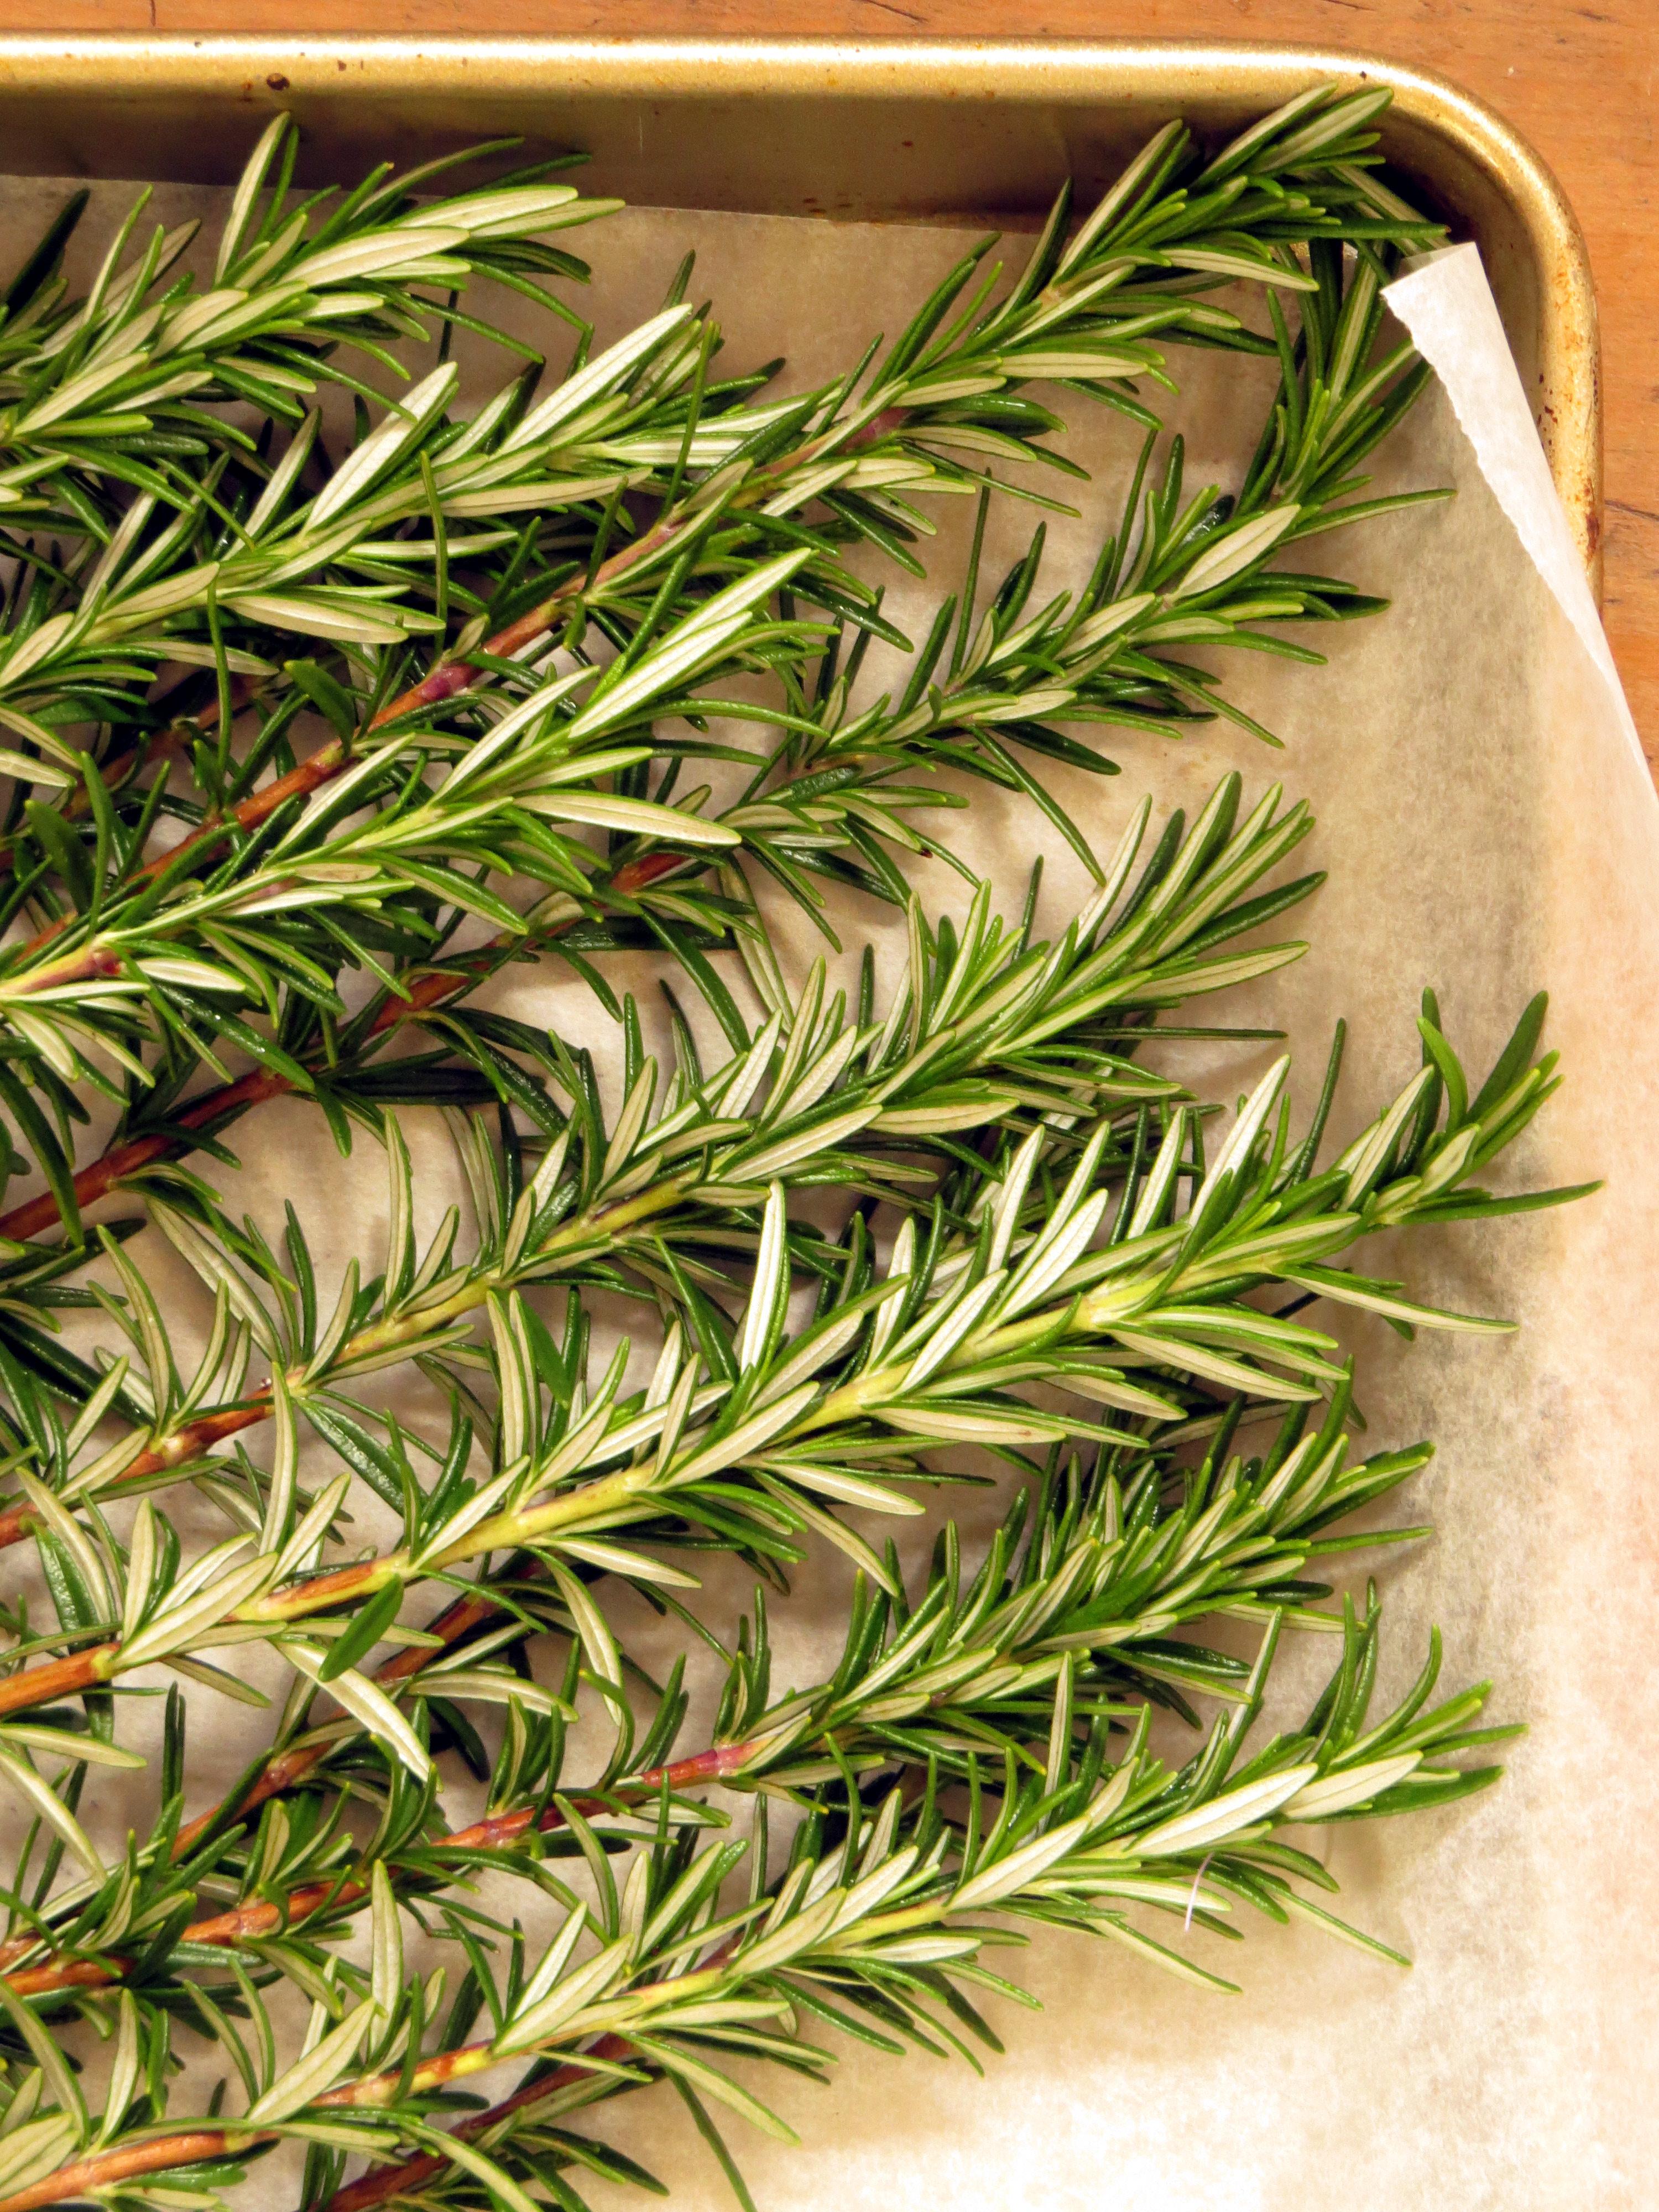 Preserving fresh herbs: rosemary & parsley | Rediscover